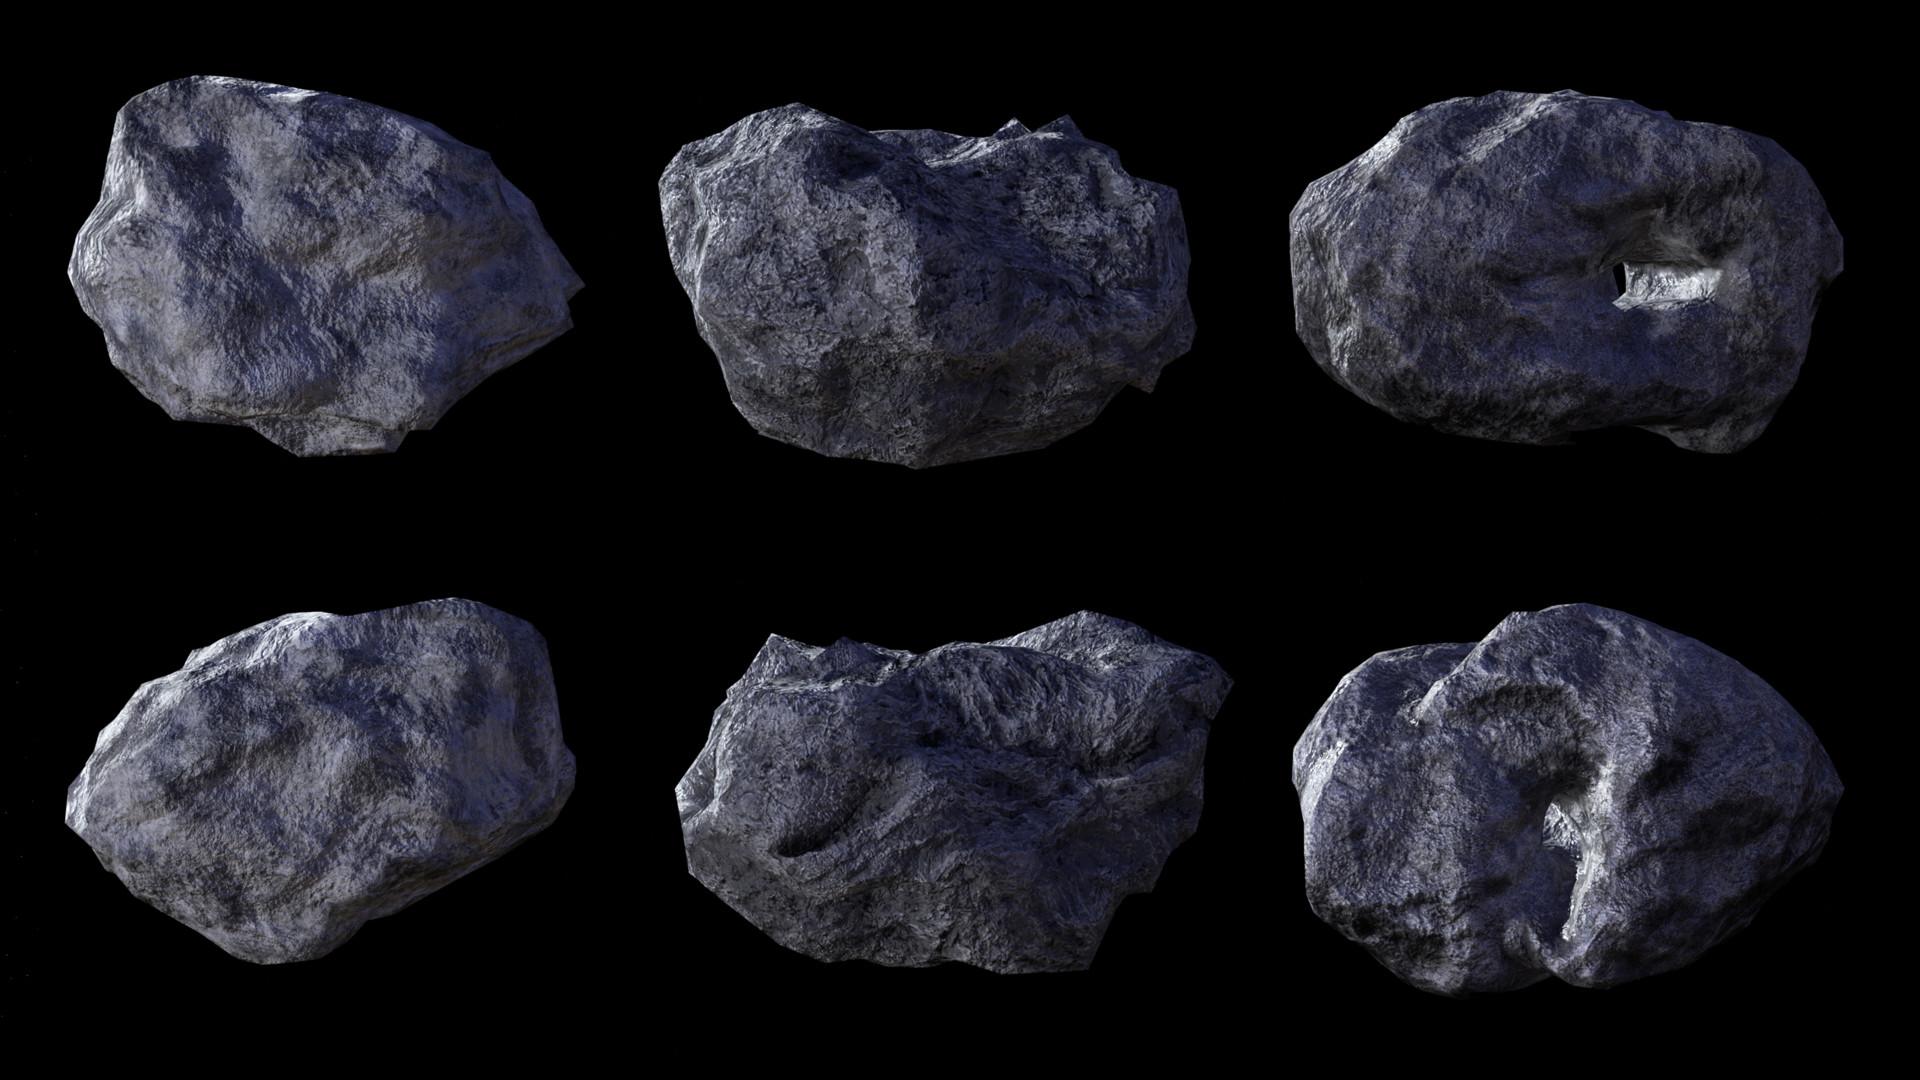 Robert kuroto asteroids 1